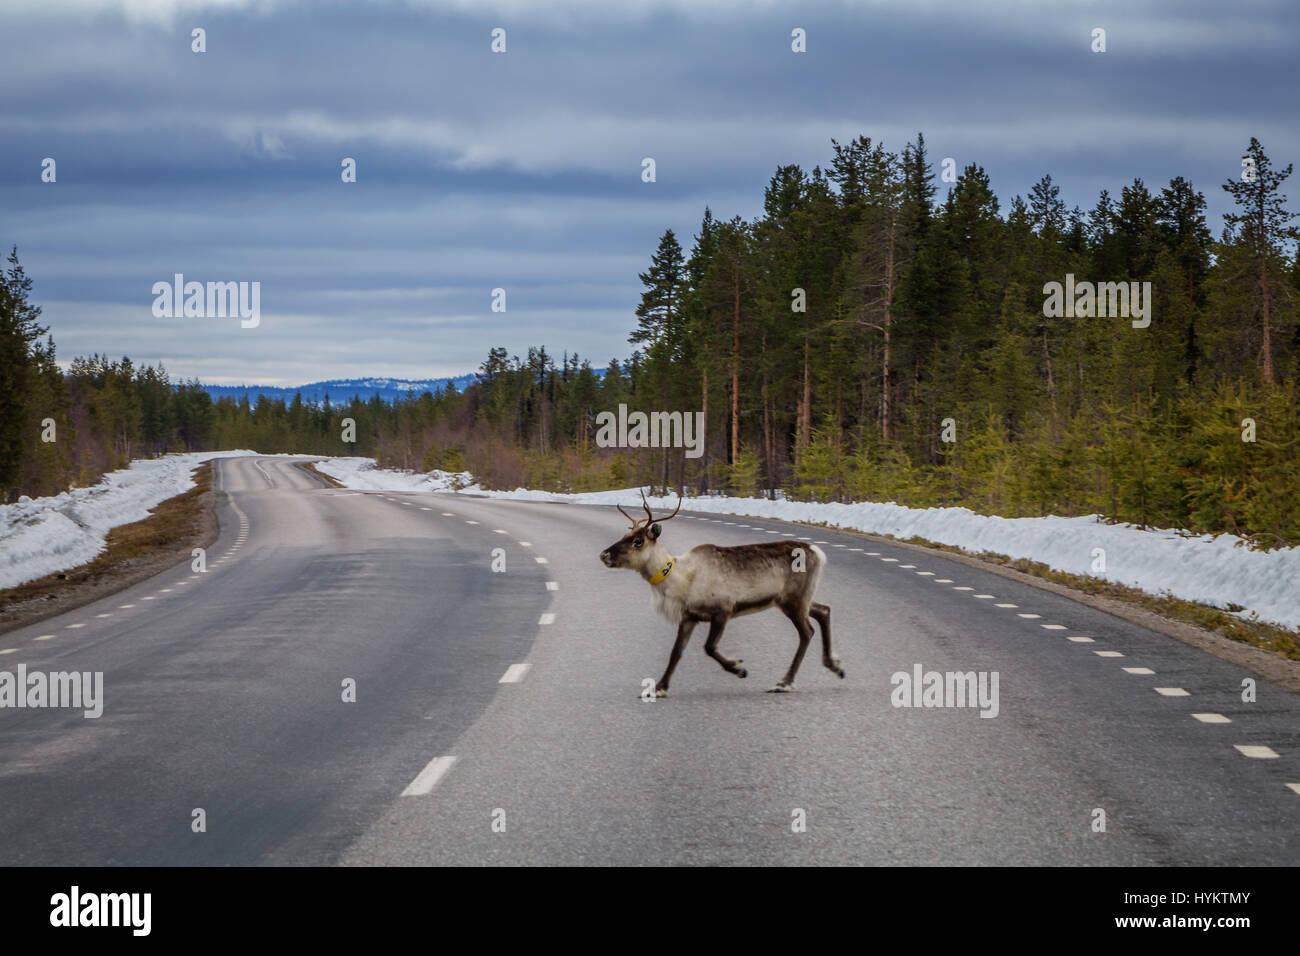 Reindeer crossing the road, Laponian Area, National Park, Stora Sjofallet, Sweden - Stock Image